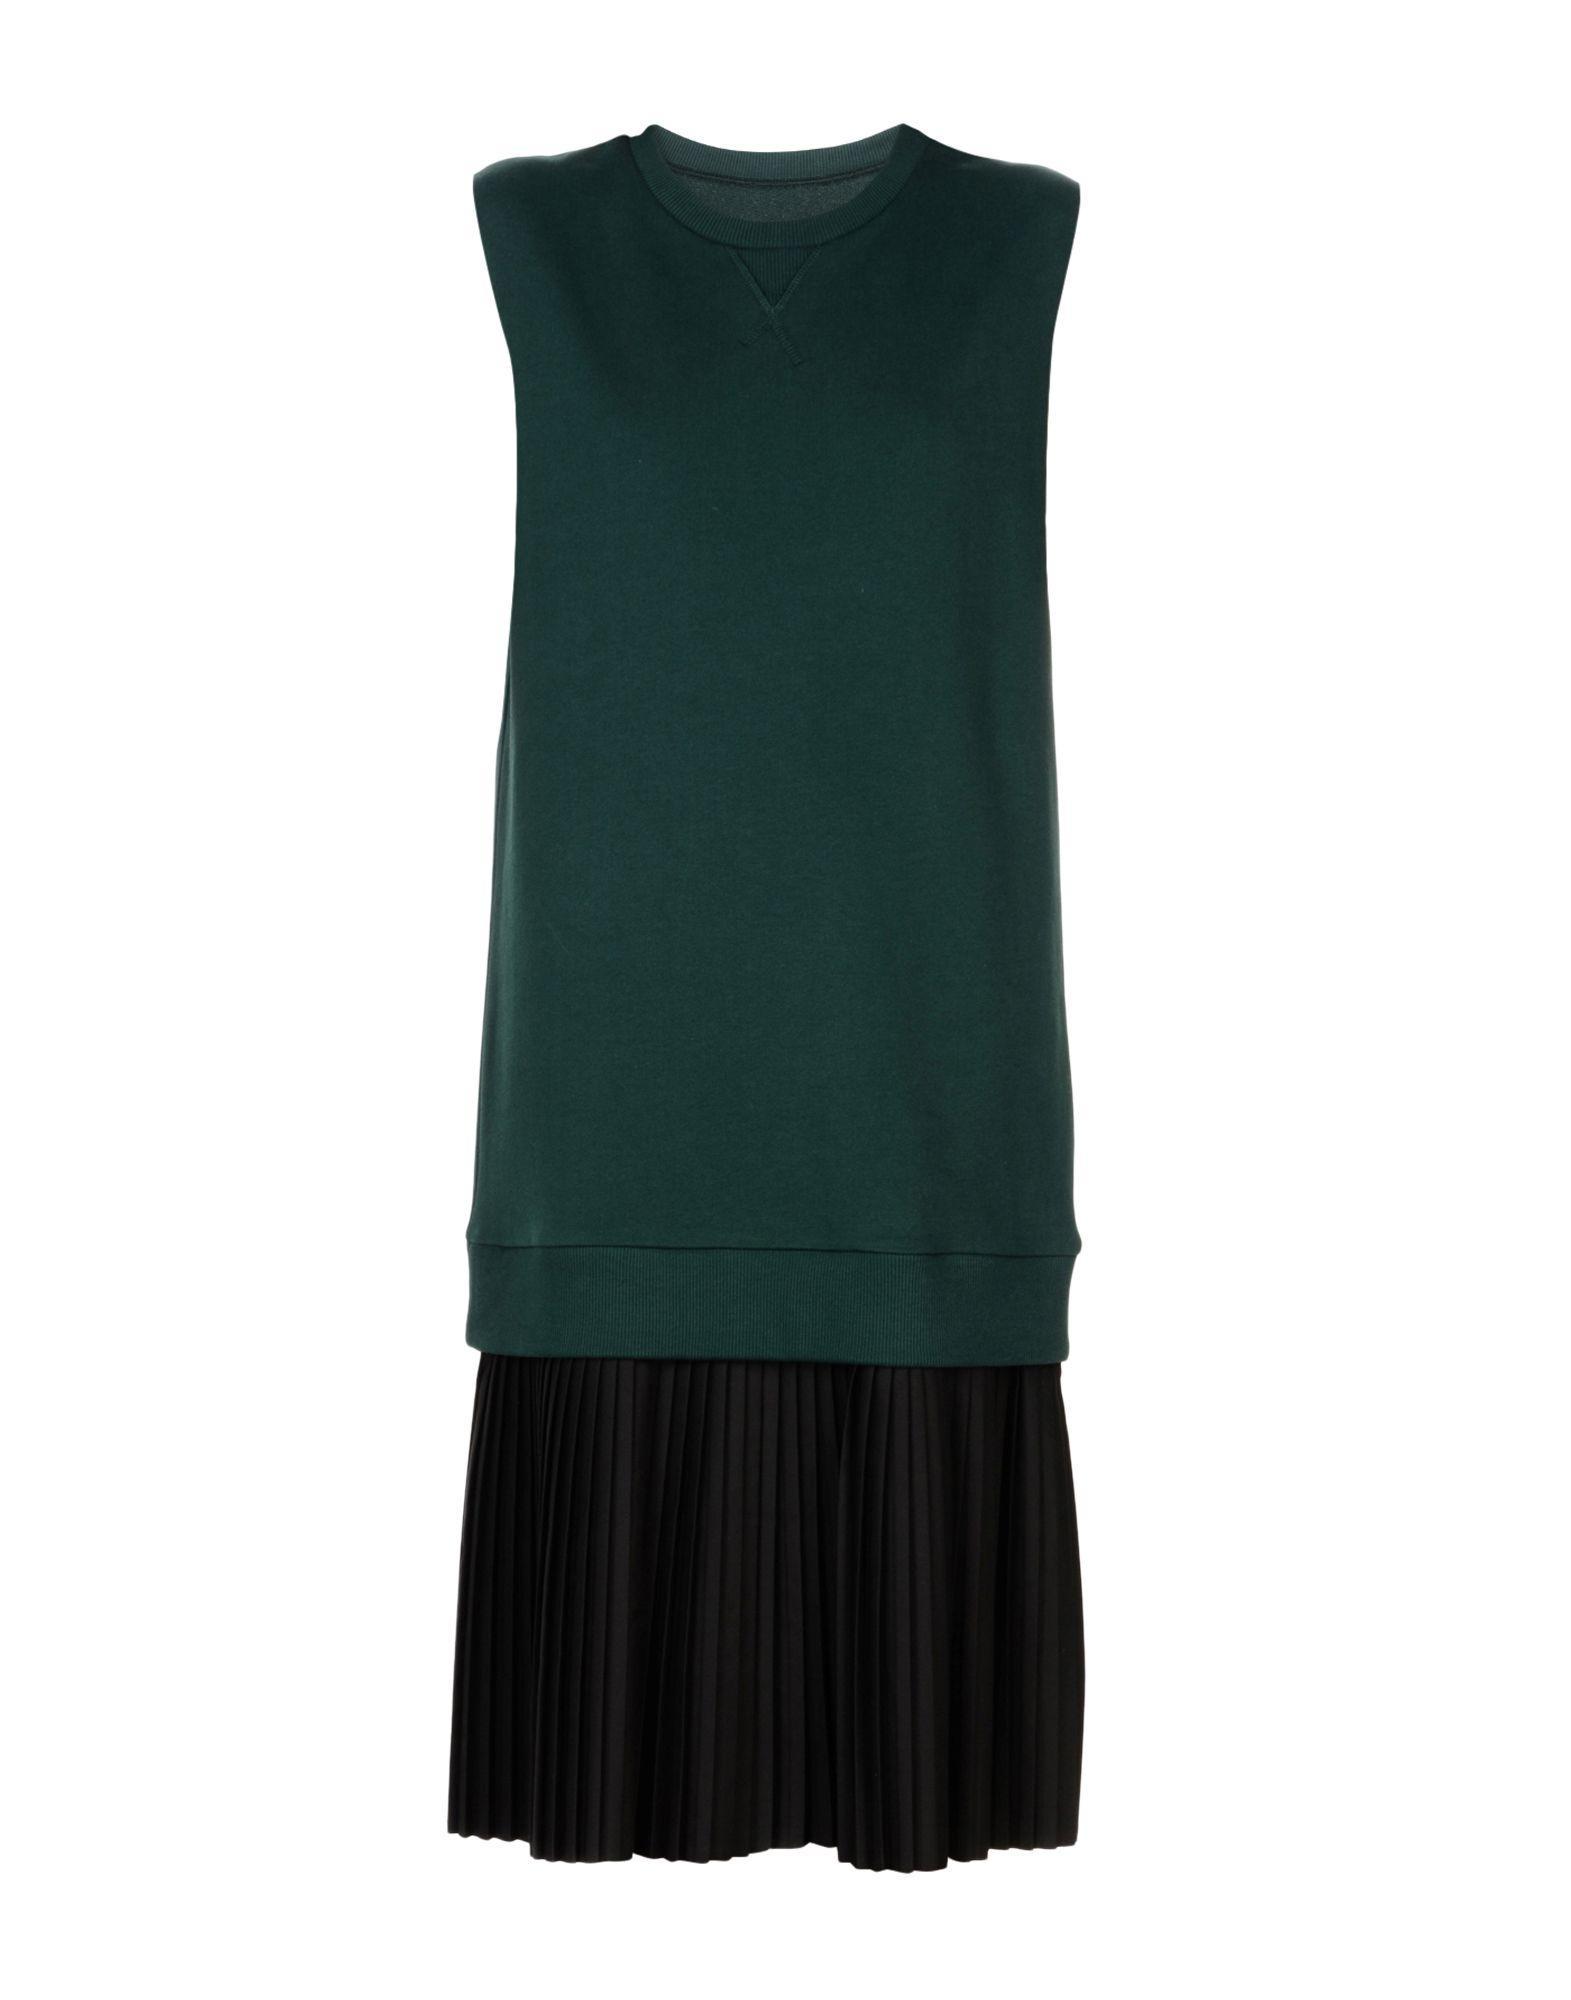 Mm6 Maison Margiela Midi Dress In Dark Green